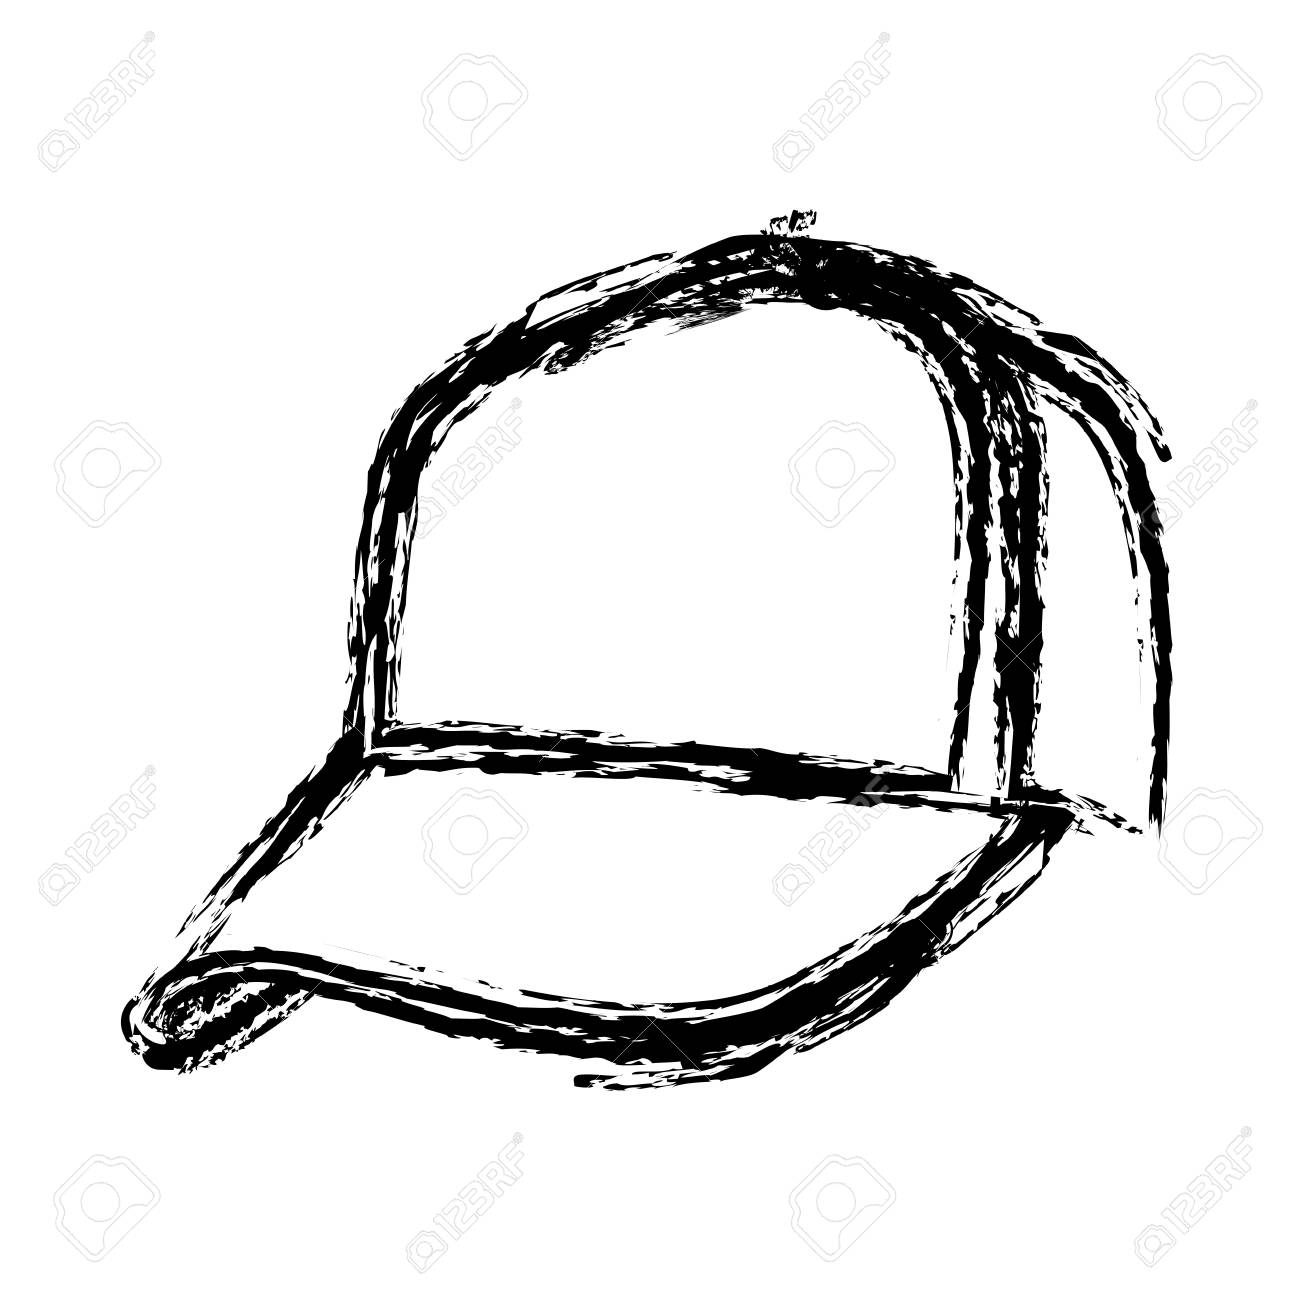 monochrome sketch of baseball cap vector illustration royalty free rh 123rf com cap victor marinetraffic cap victor marinetraffic